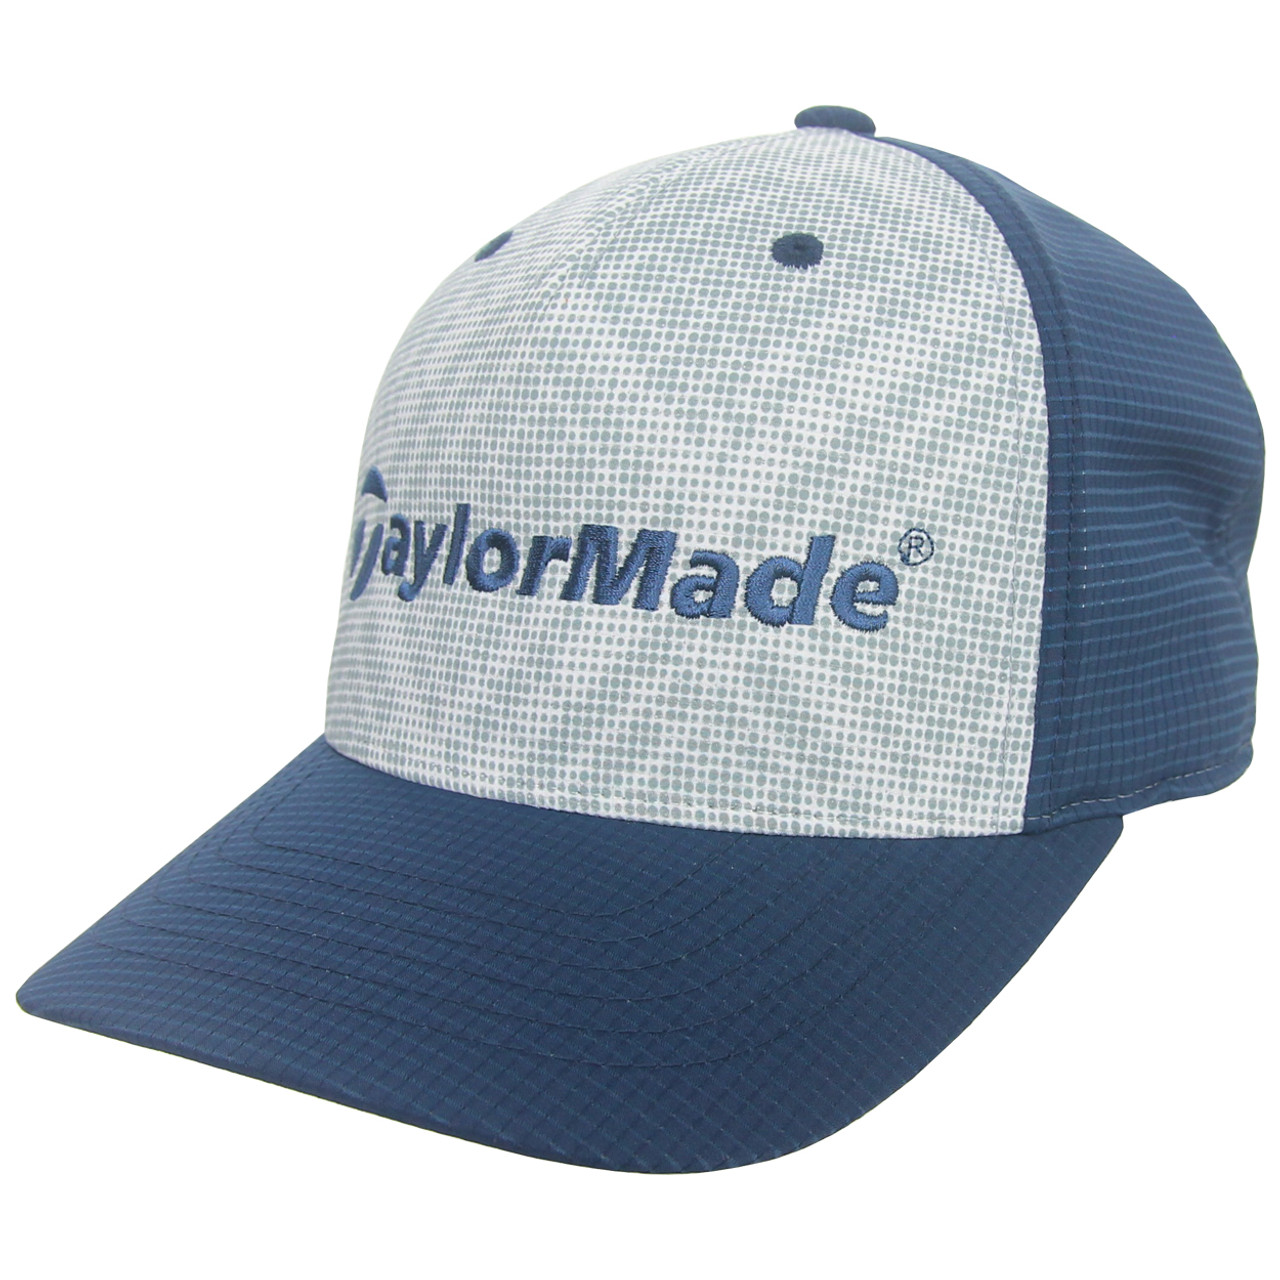 055a67aec3e TaylorMade Adidas ClimaCool Flexfit Tech 110 Snapback Hat. https  d3d71ba2asa5oz.cloudfront  Taylormade Lifestyle New ...